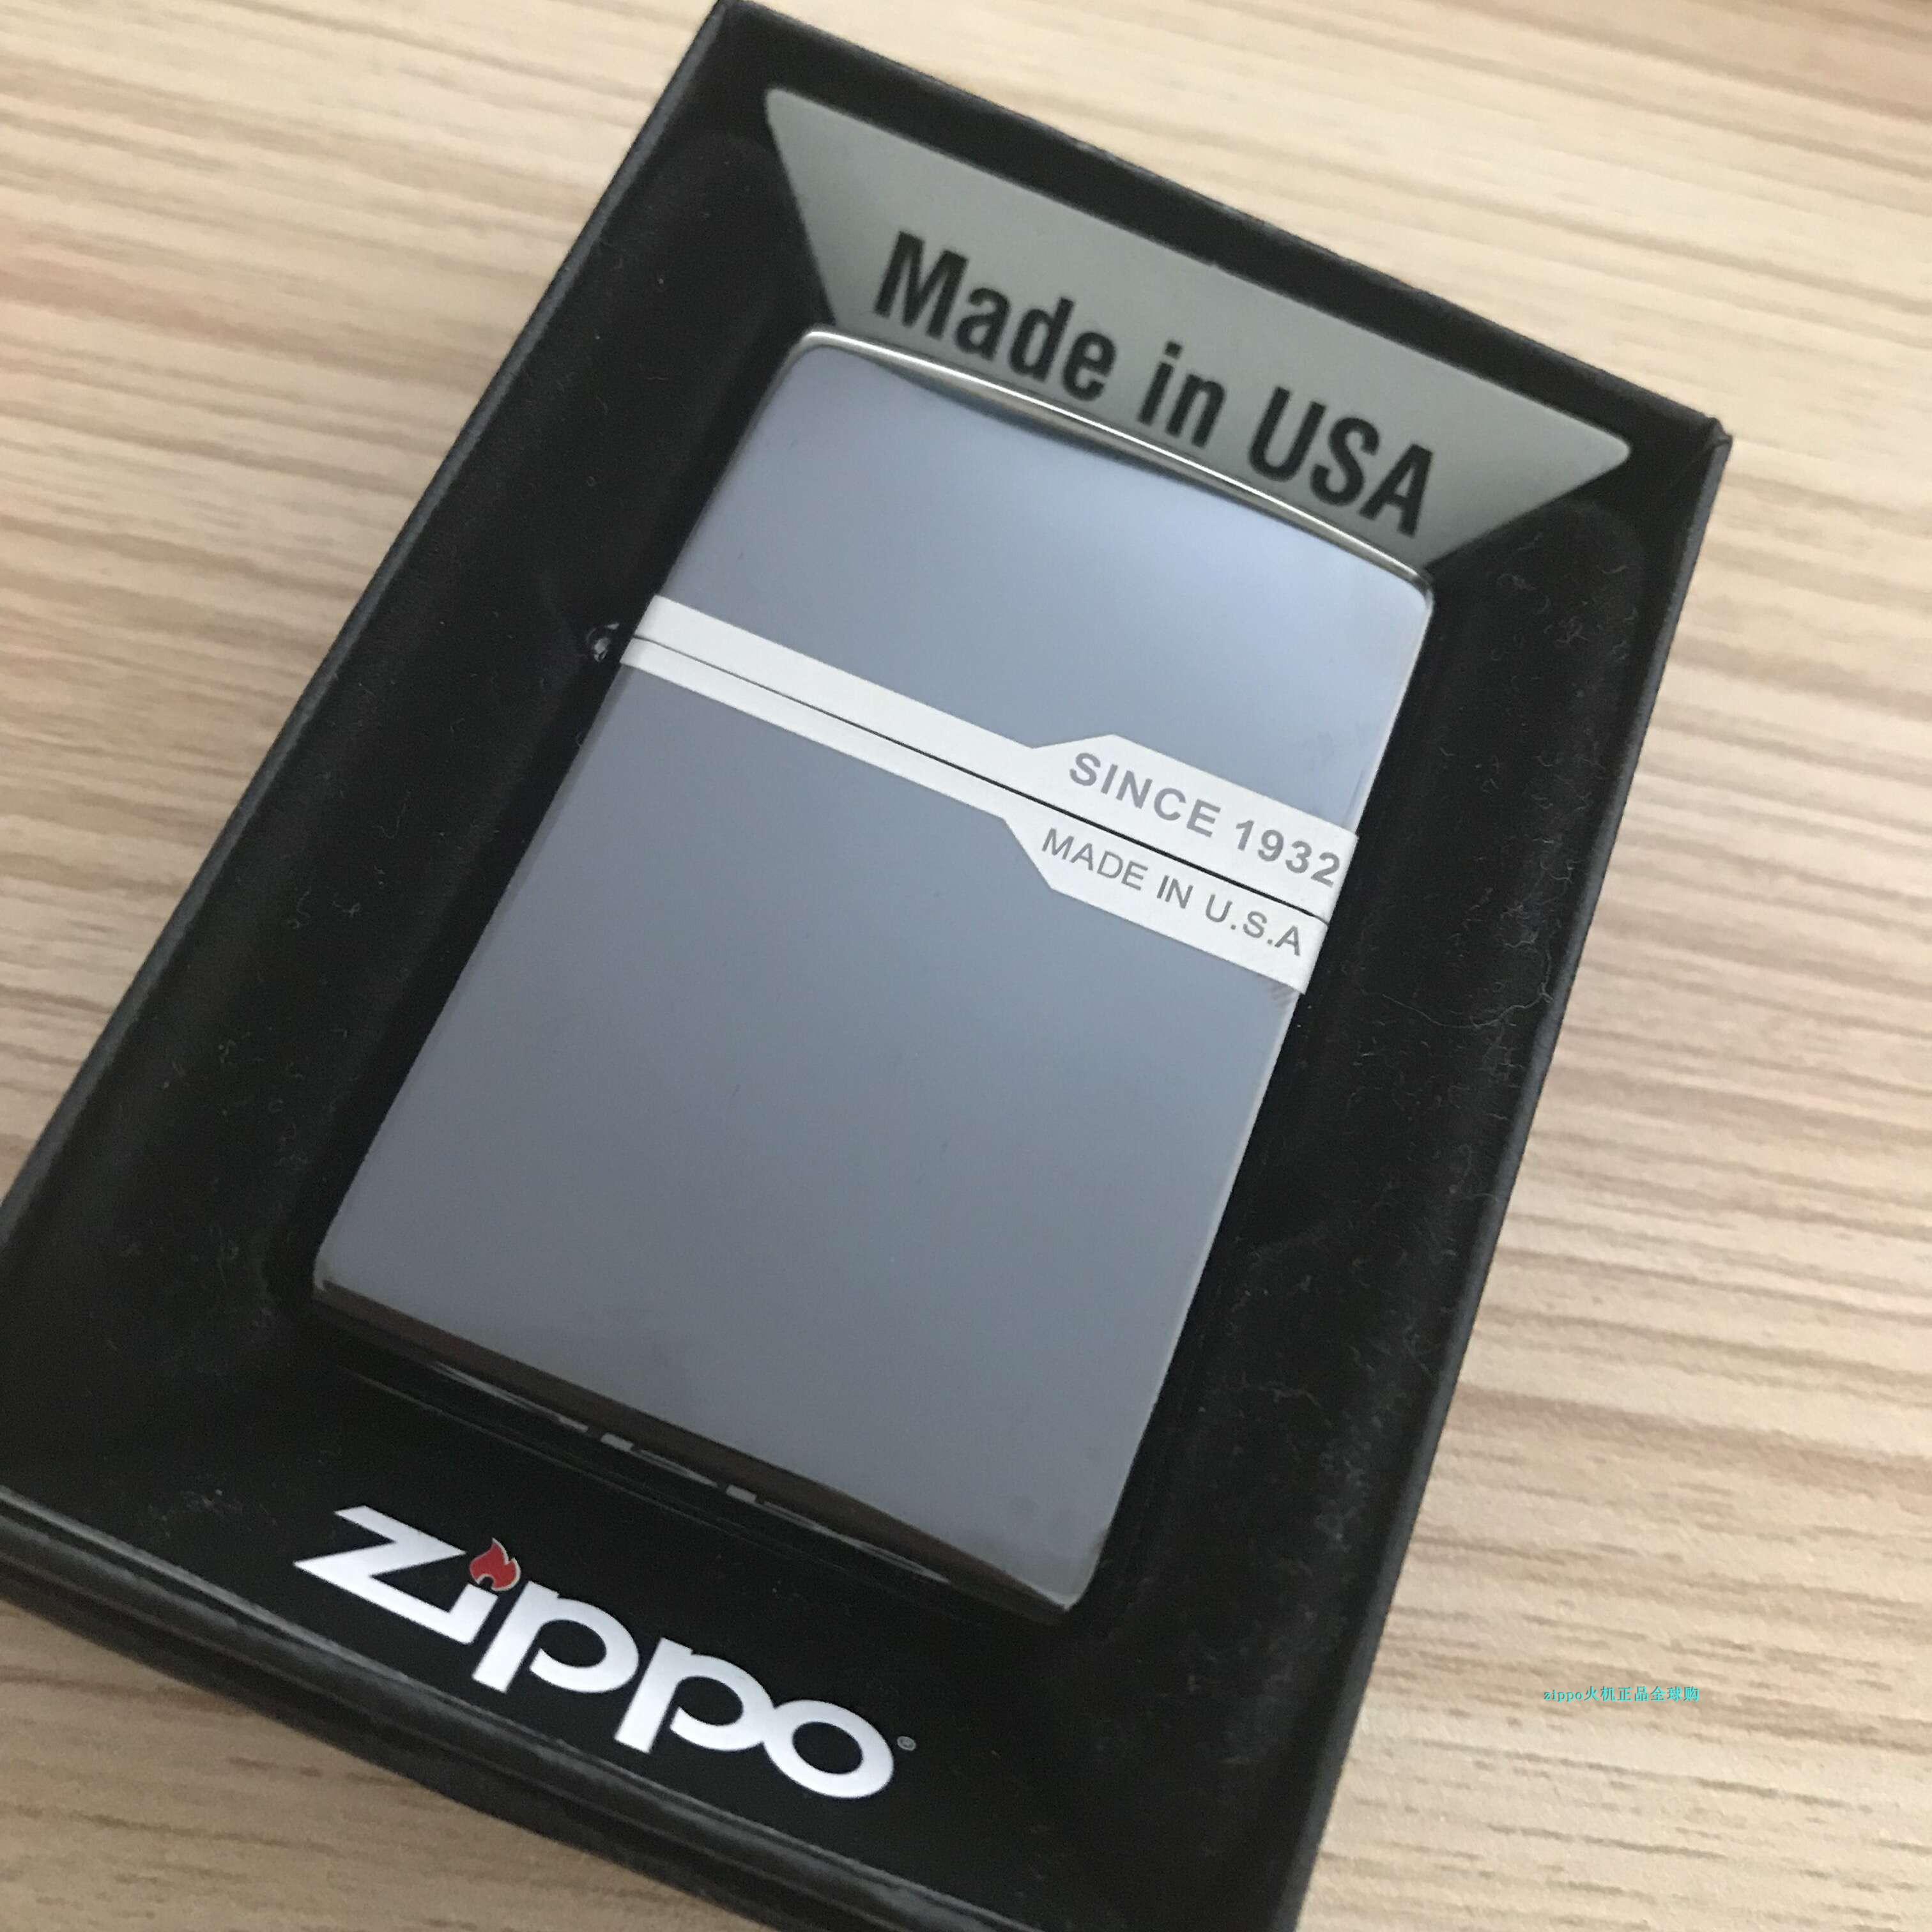 zippo打火机原装正品 黑炫冰 经典横标志 美国制造 芝宝火机正版